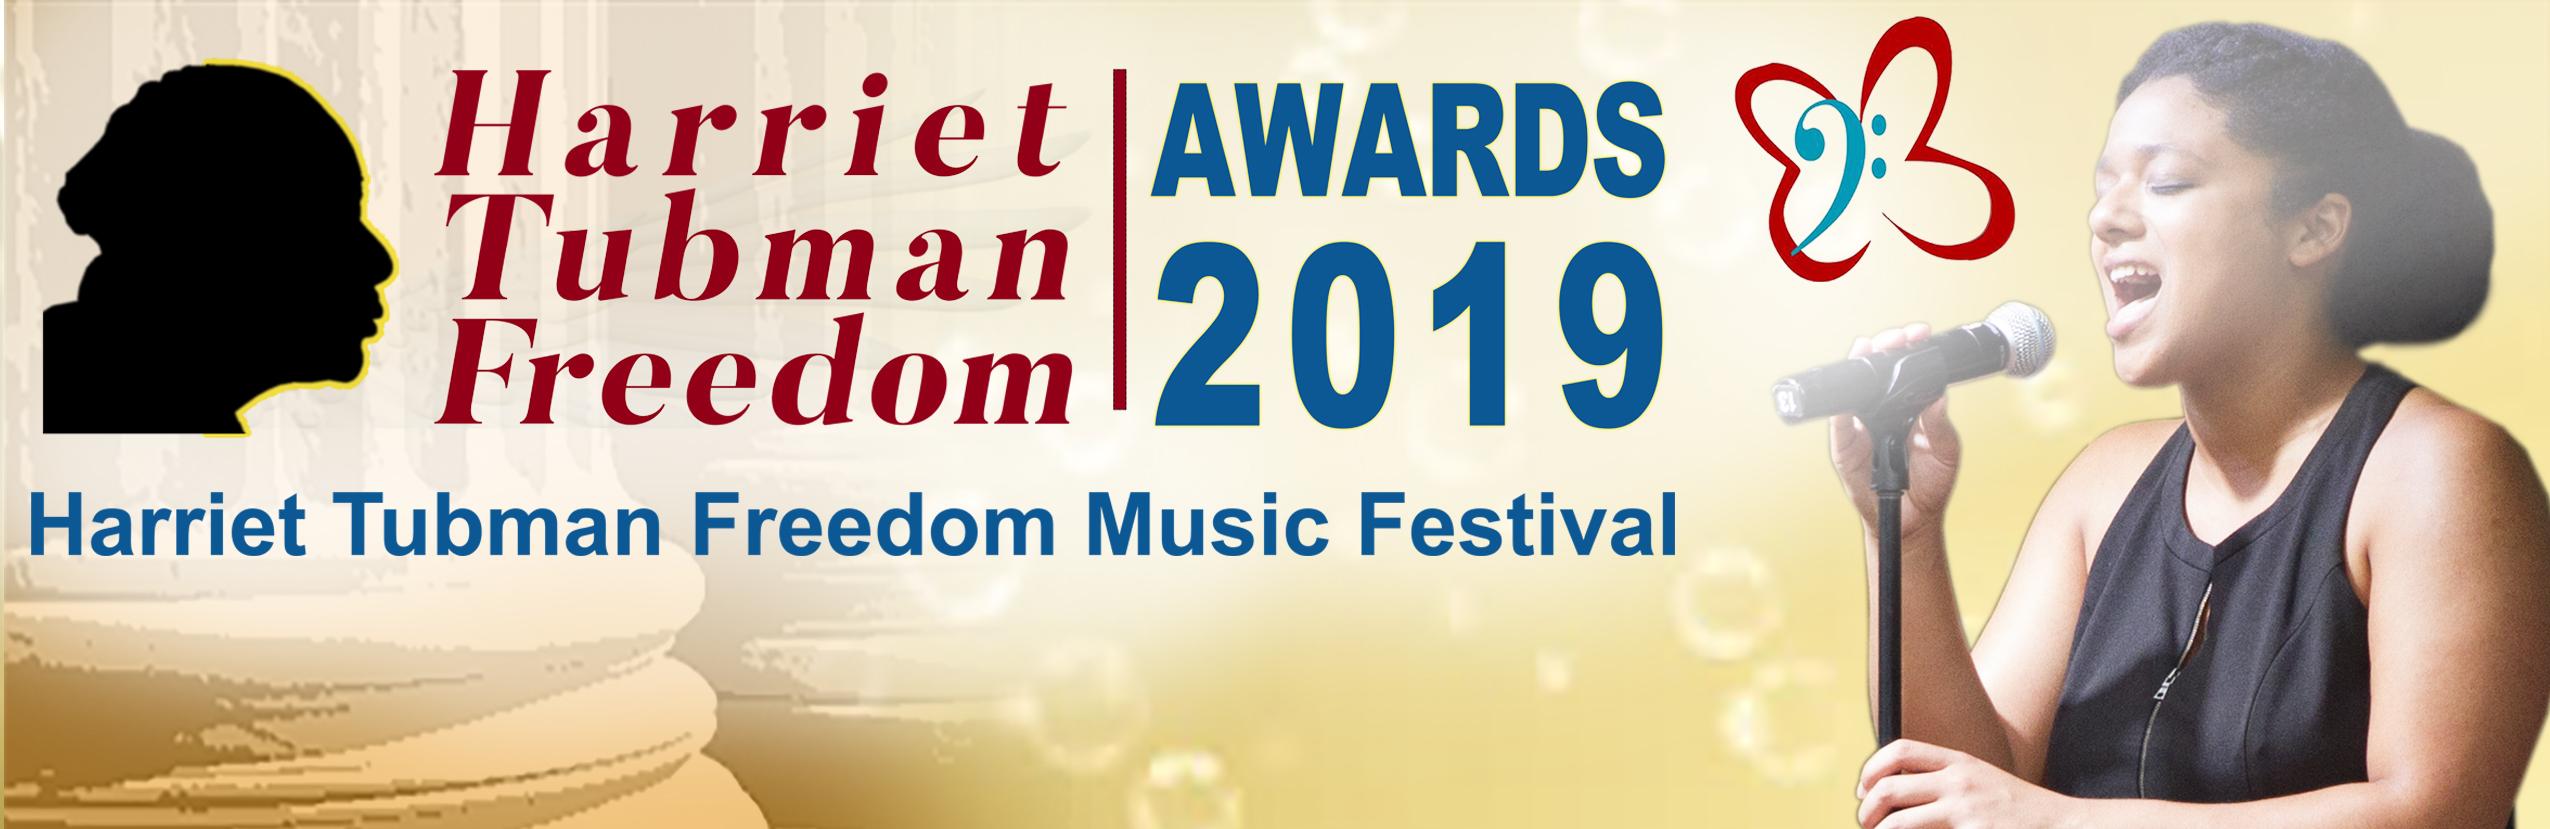 Harriet Tubman Freedom Awards and Gospel Brunch - Promotion - Banner